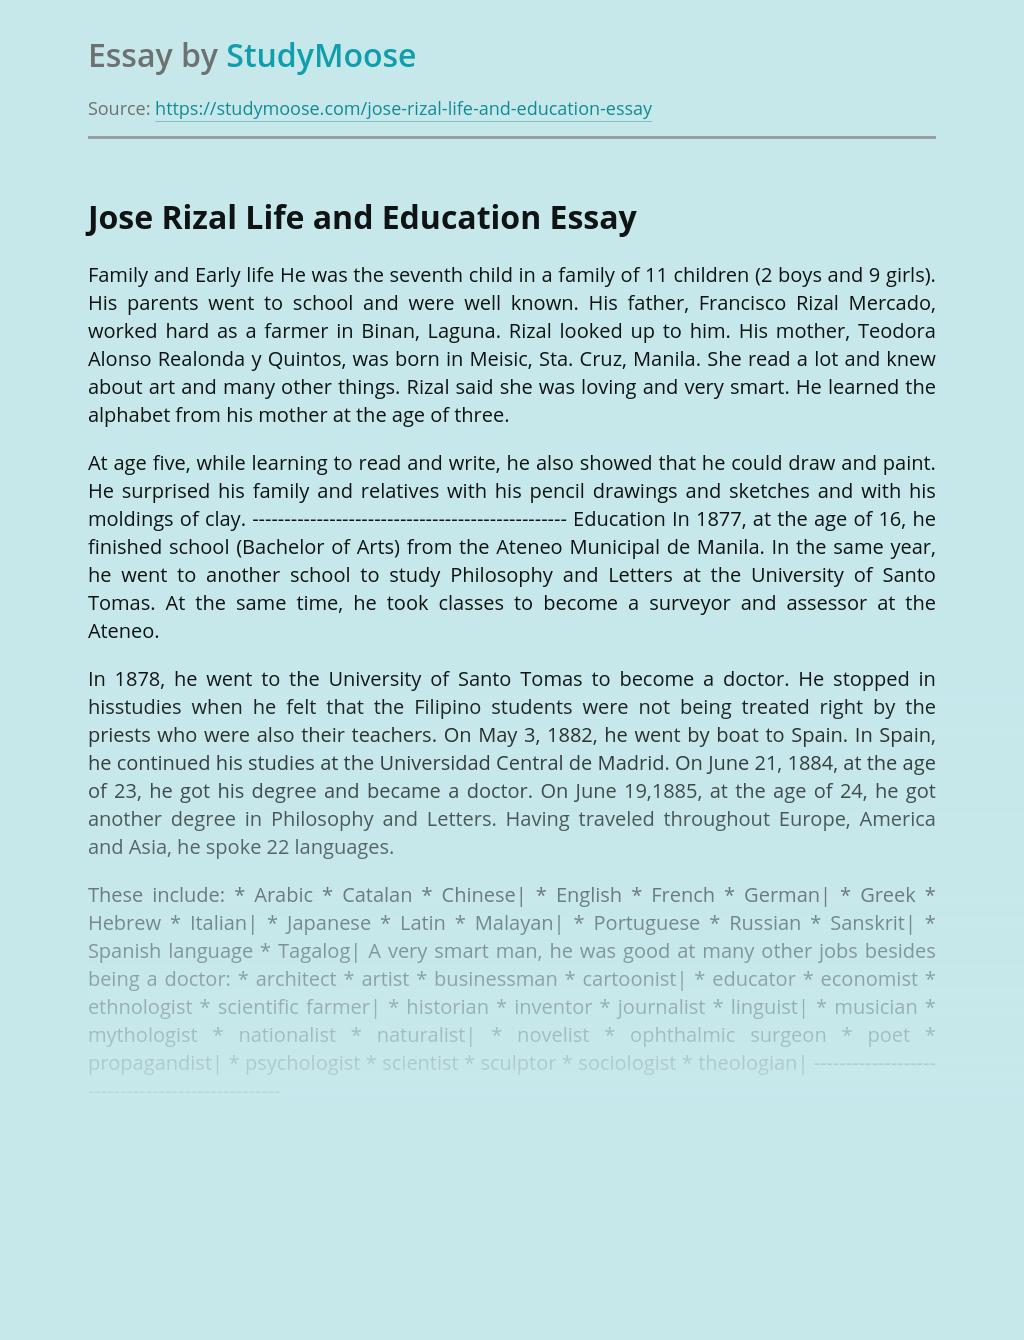 Jose Rizal Life and Education